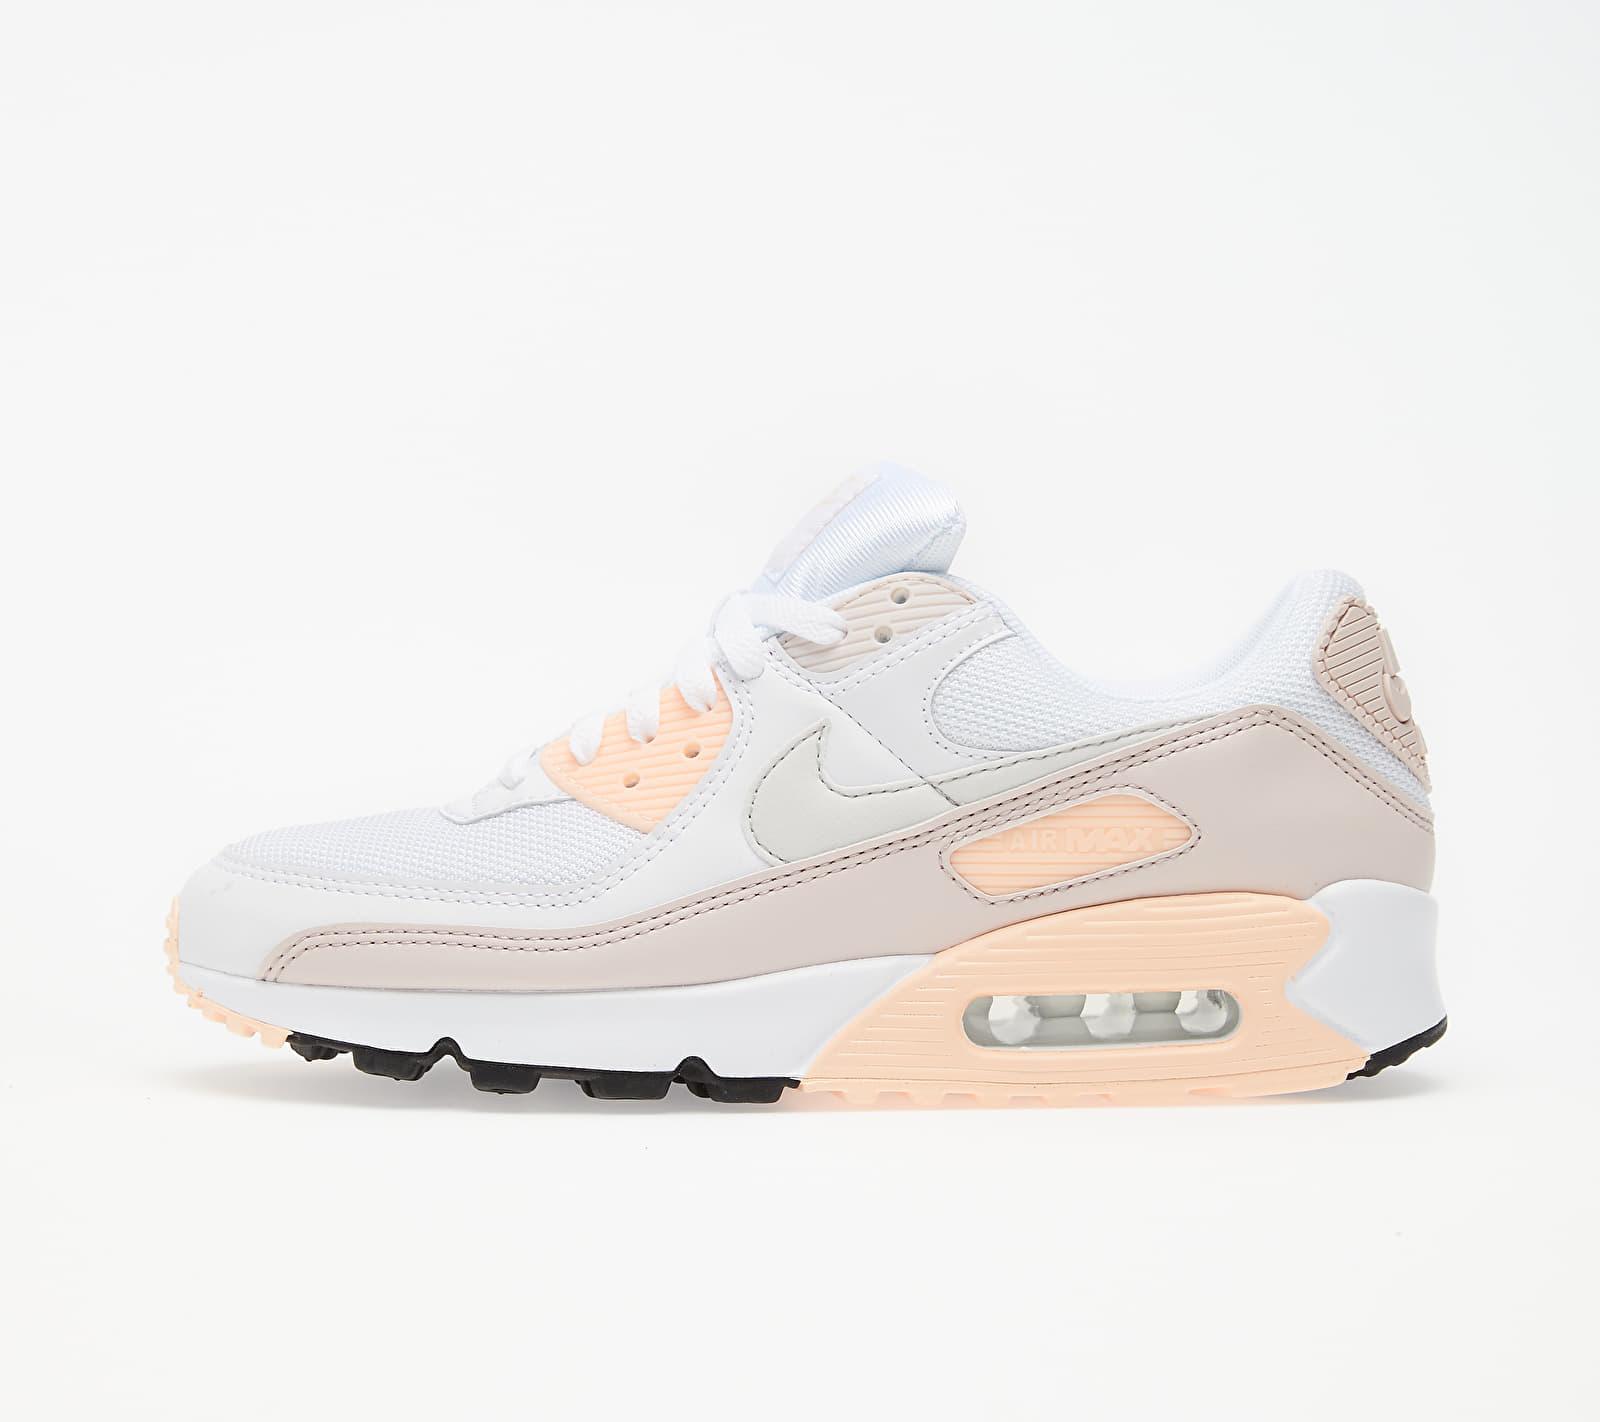 Nike W Air Max 90 White/ Platinum Tint-Barely Rose CT1030-101